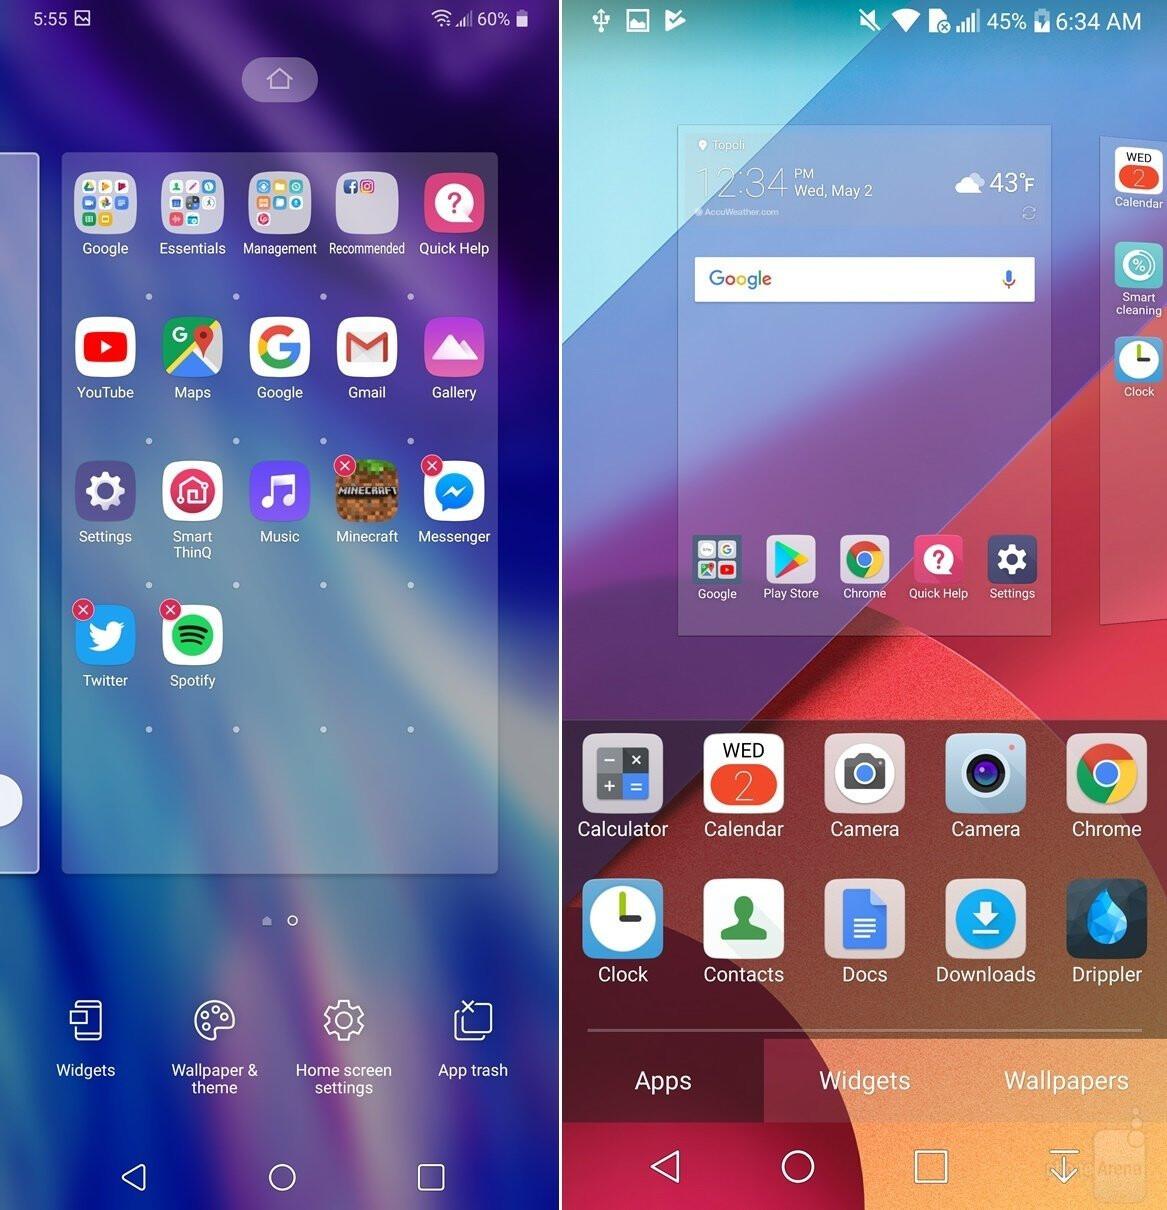 LG G7 ThinQ UI comparison vs LG G6: A walkthrough of the